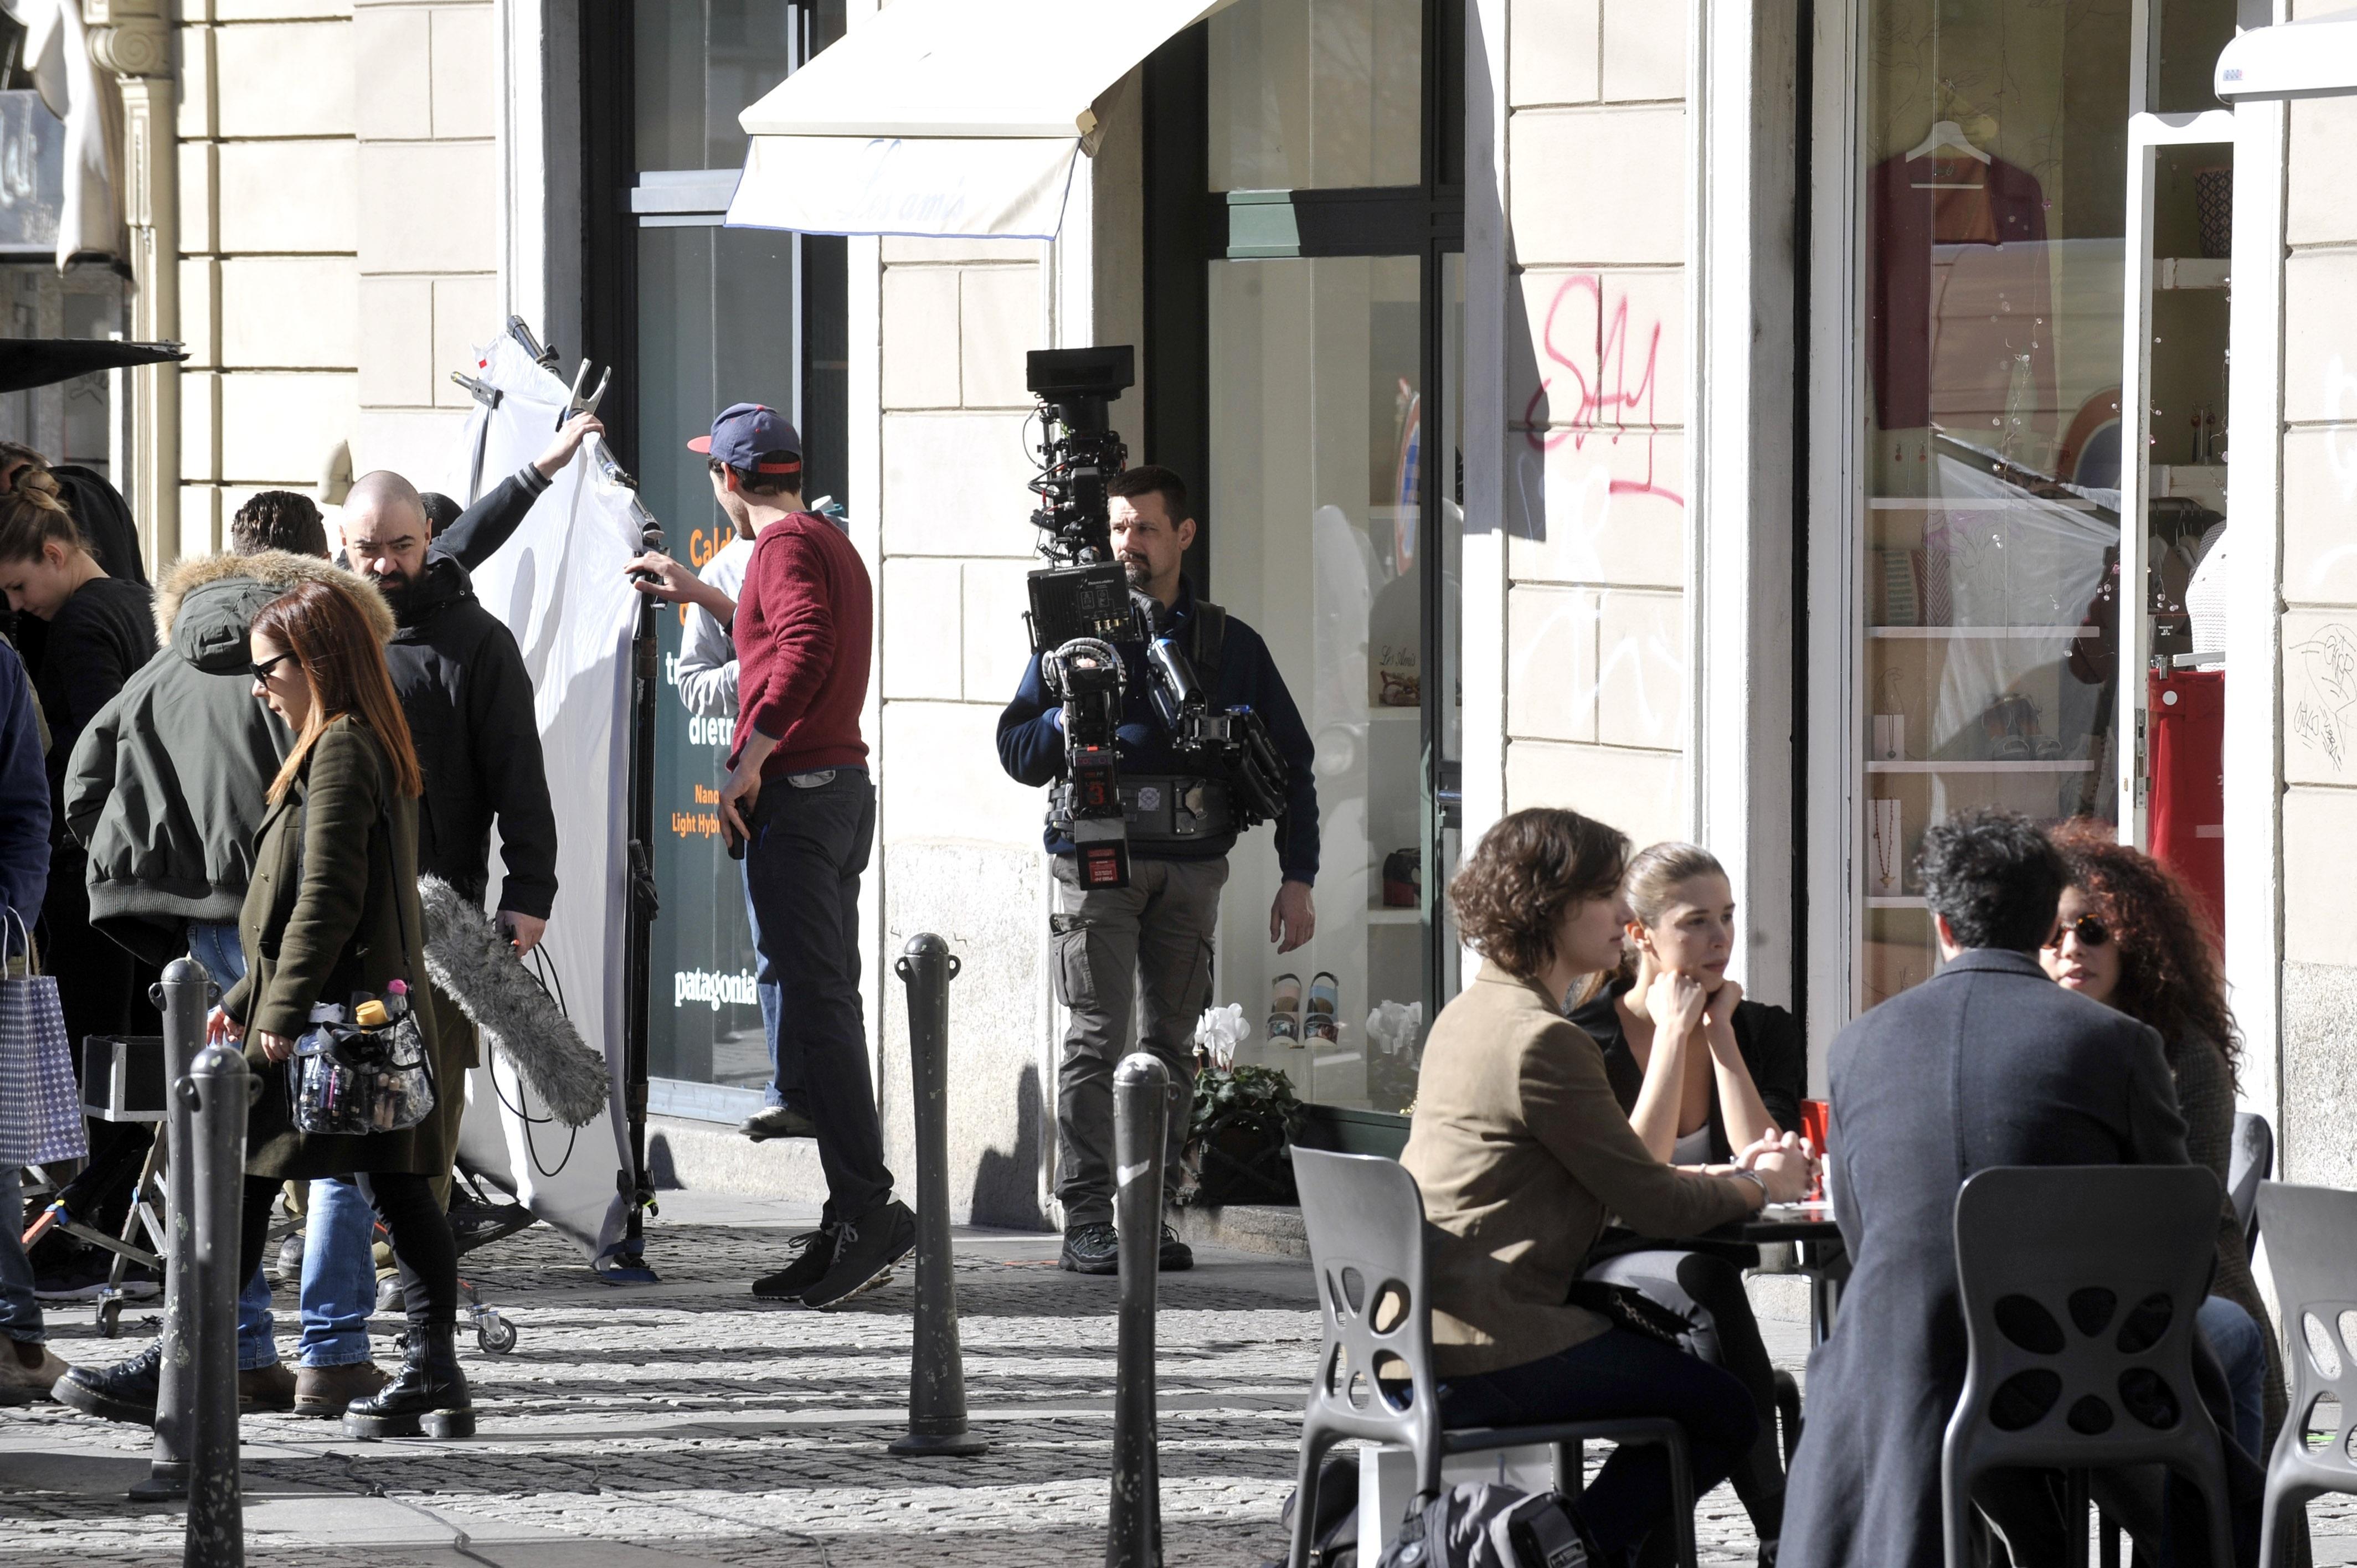 Set cinematografici. Film, Tv girati a Milano (4)-2